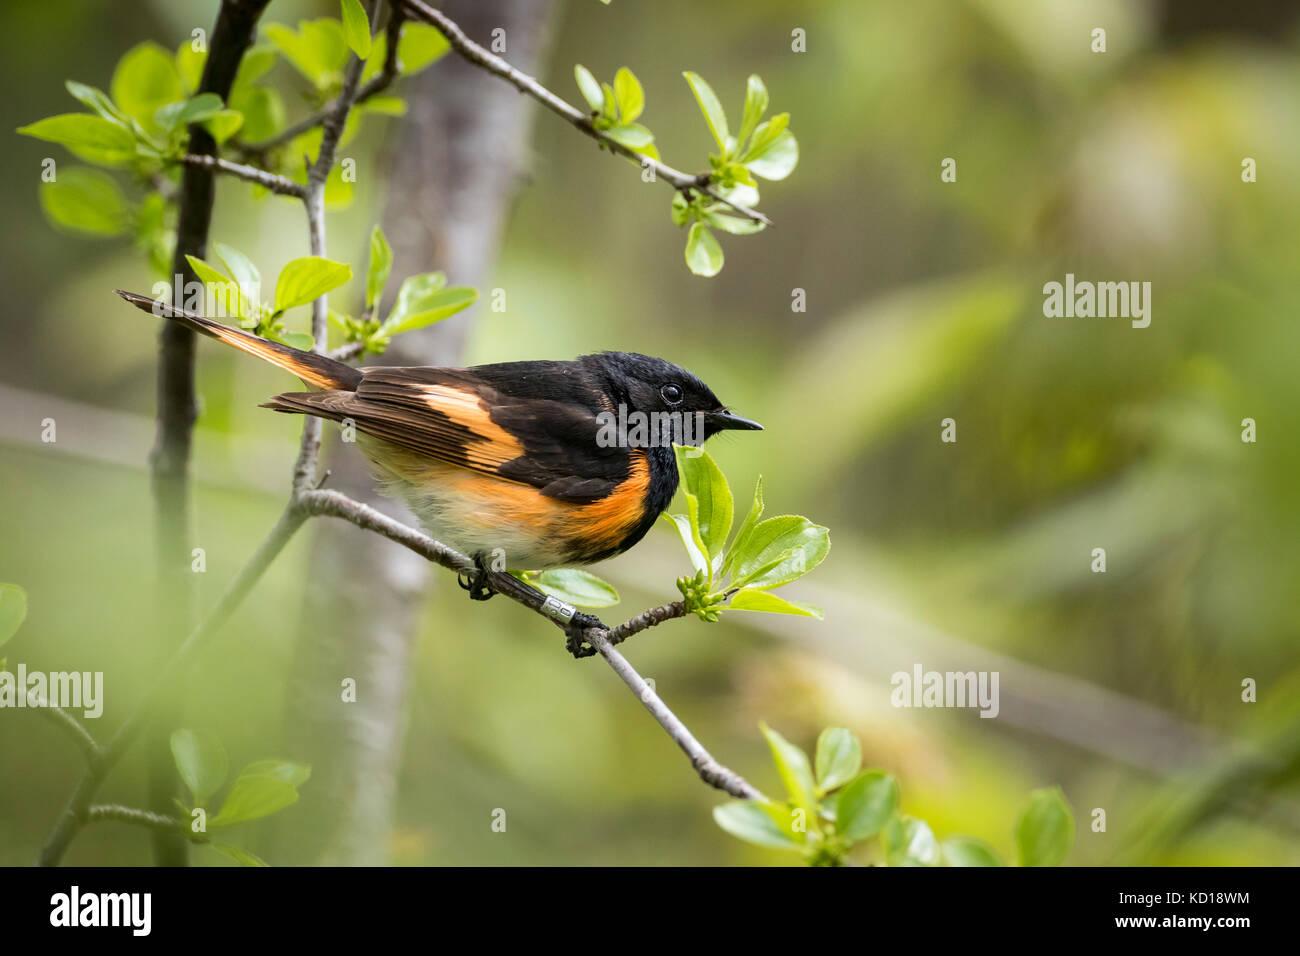 Male American Redstart (Setophaga ruticilla), Prince Edward Point National Wildlife Area, Ontario, Canada - Stock Image